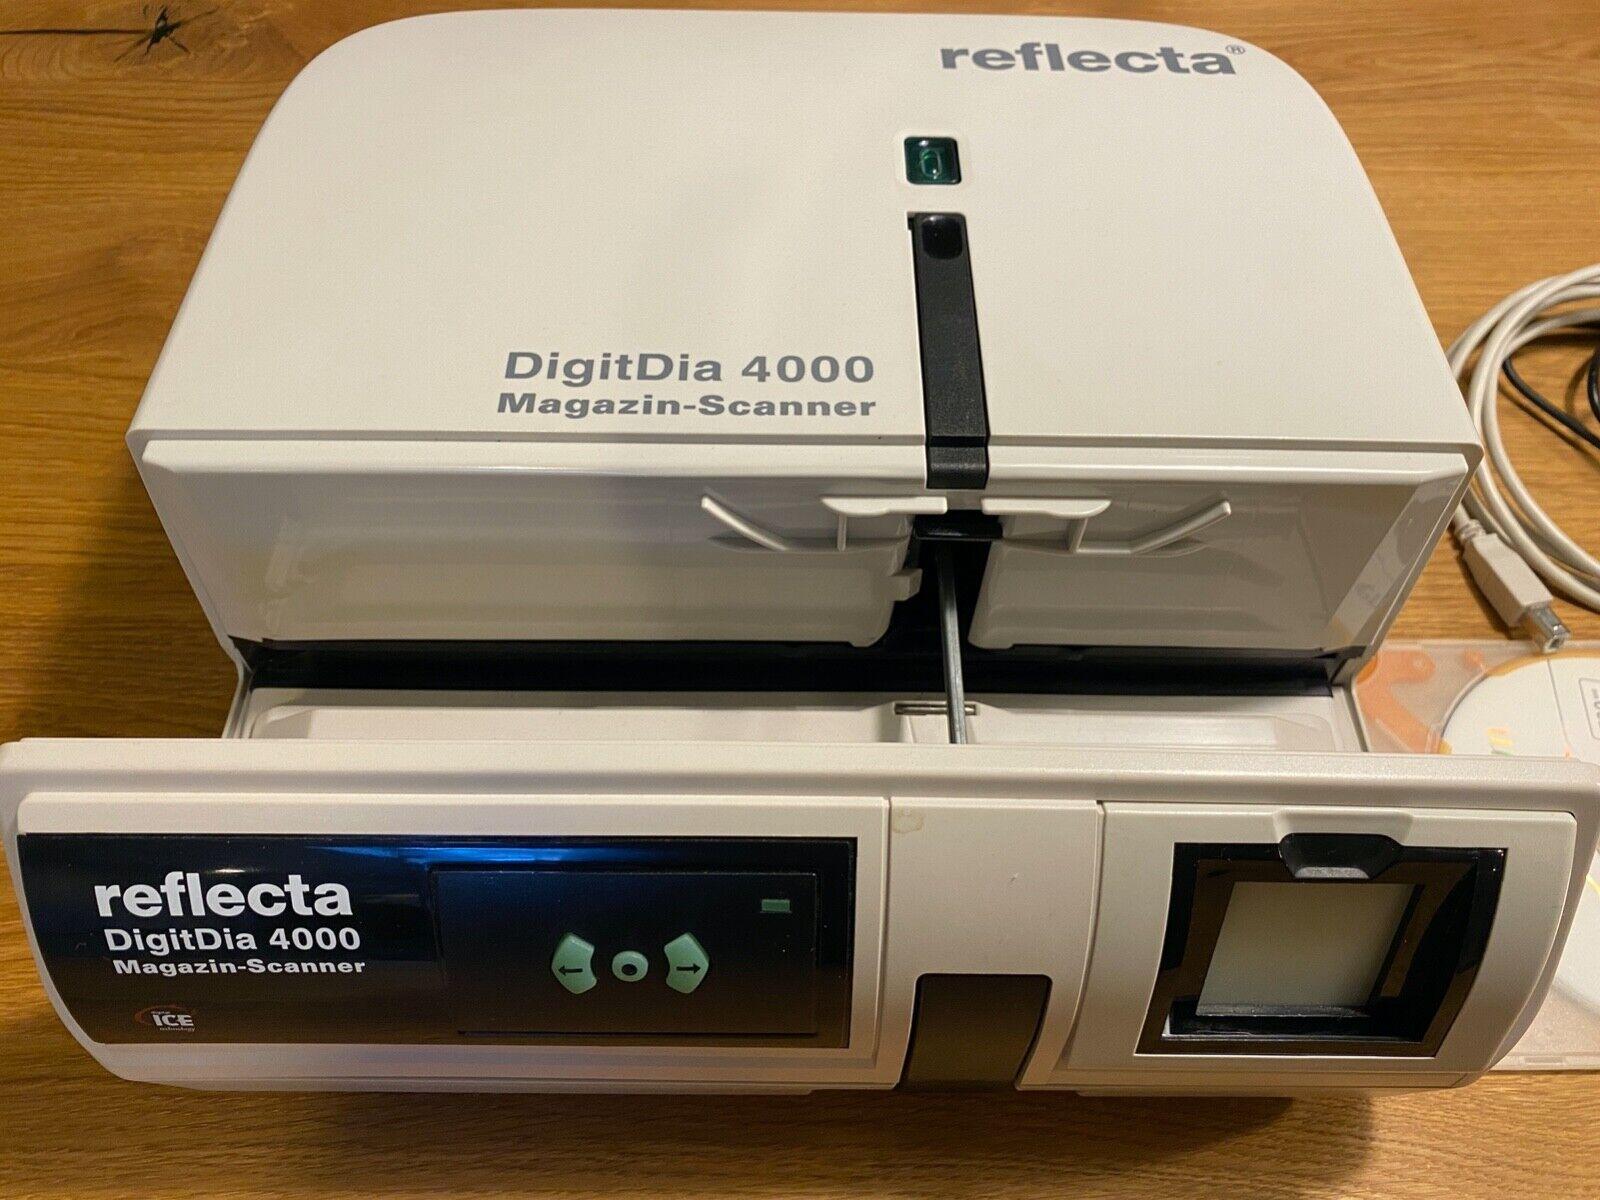 Reflecta DigitDia 4000 Diascanner Magazinscanner USB Firewire Mac Windows